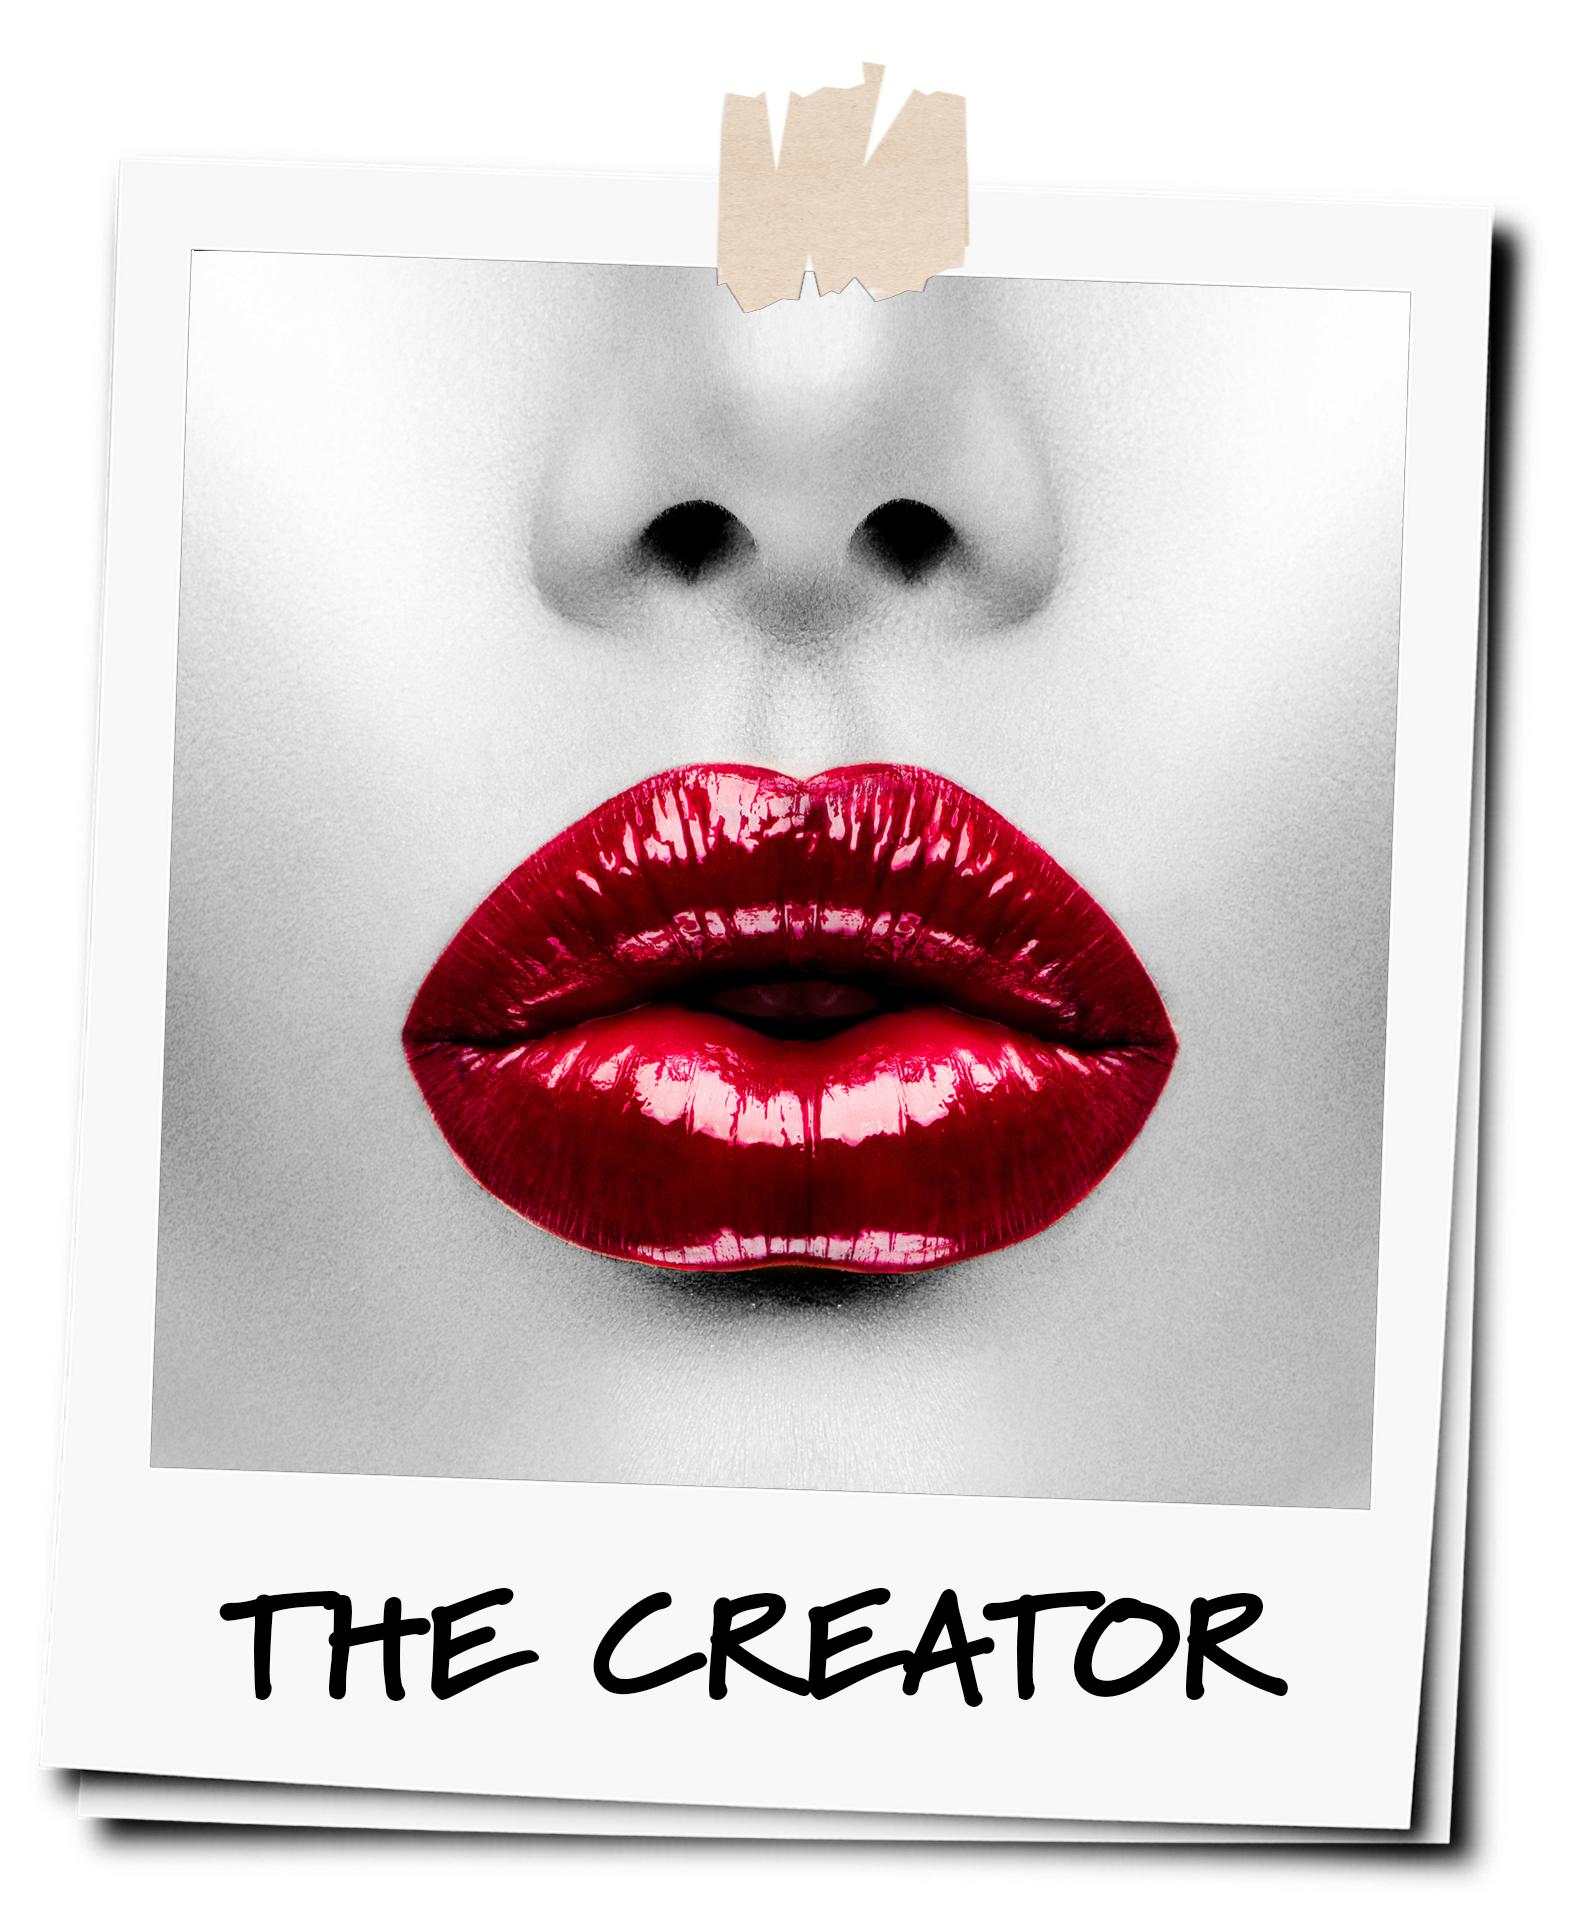 Thecreatorlips.png